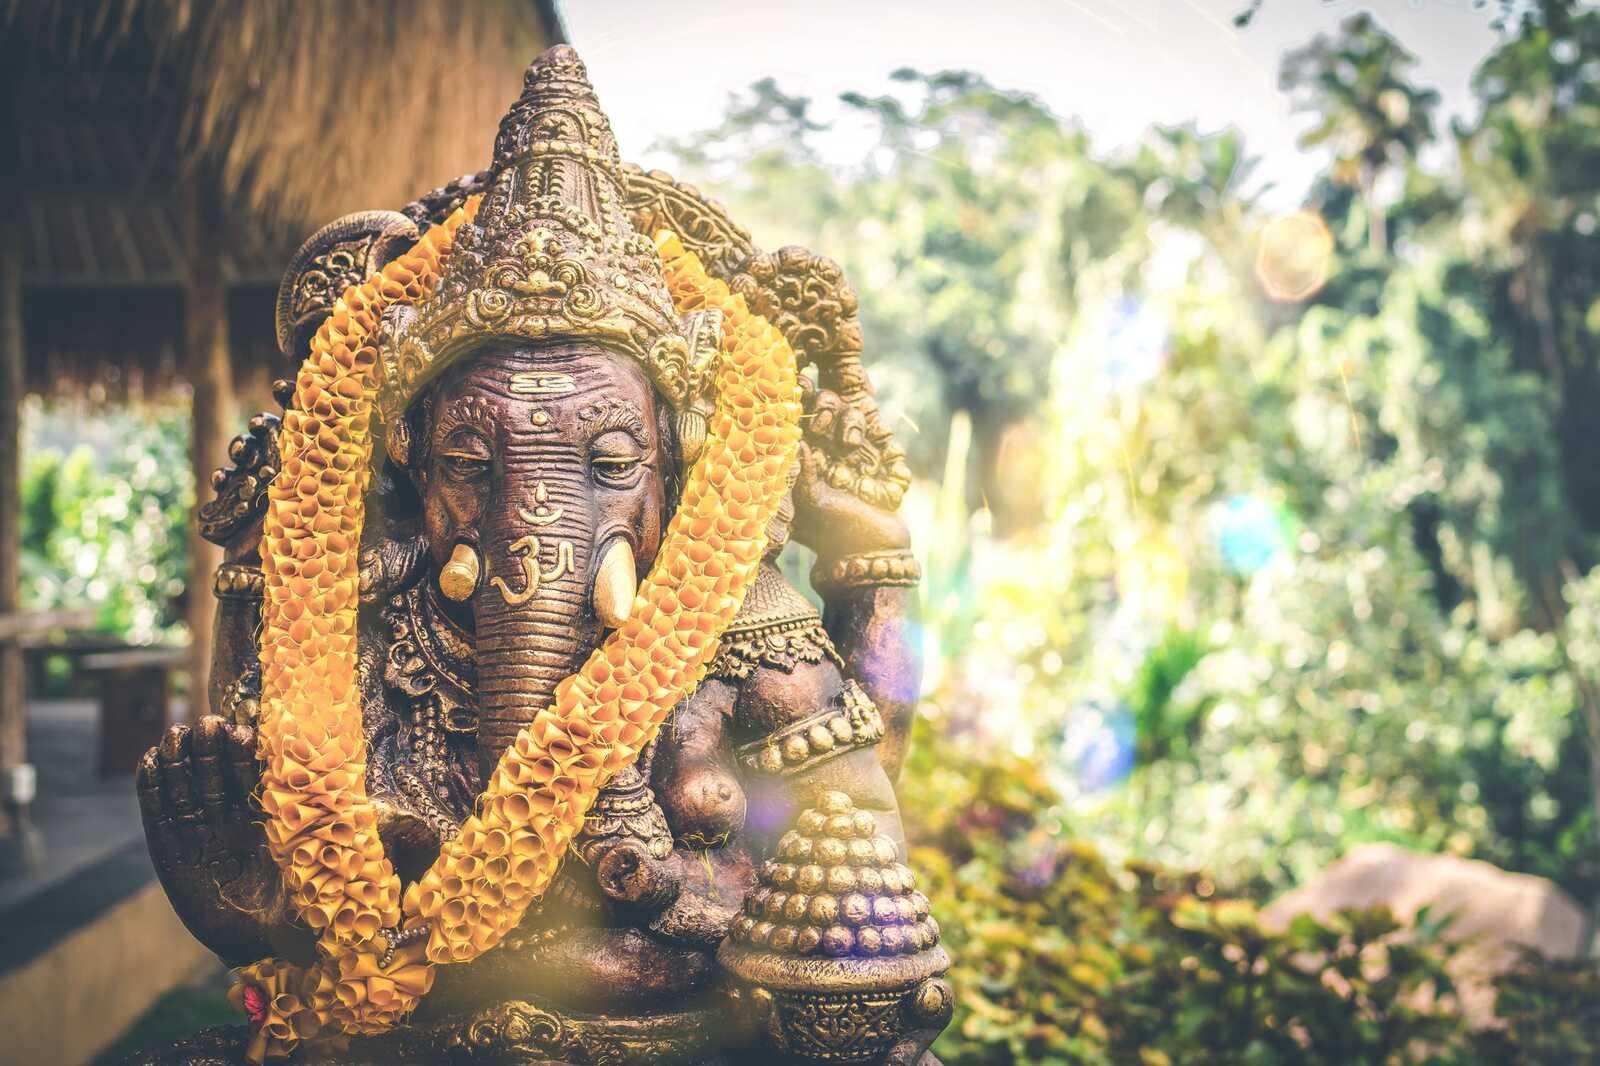 Religie, Spiritualiteit & Filosofie